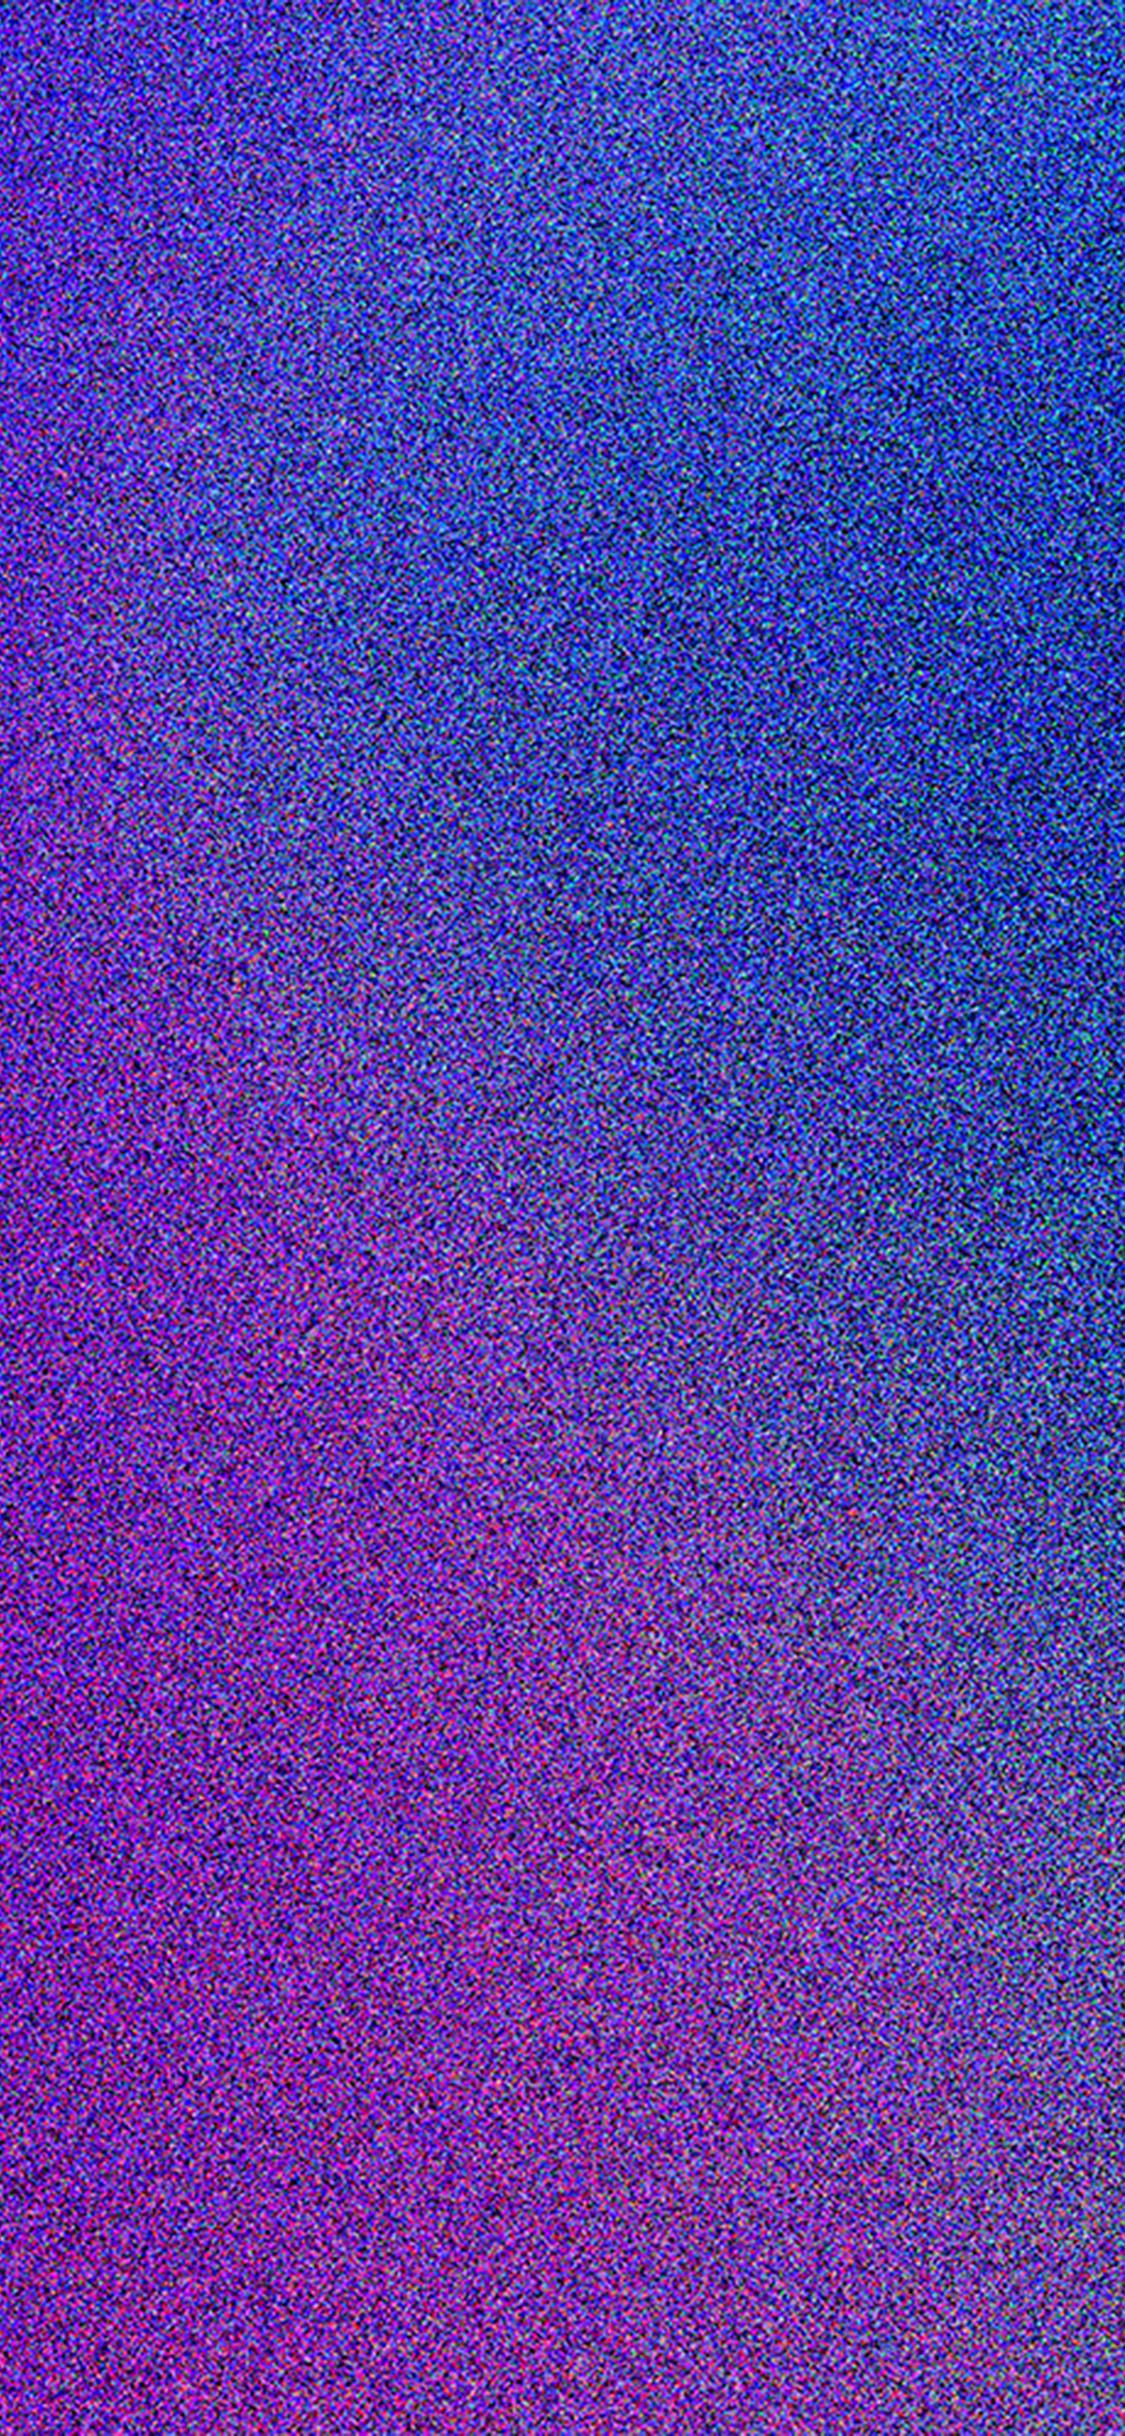 Wb64 Dots Blue Purple Pattern Background Wallpaper